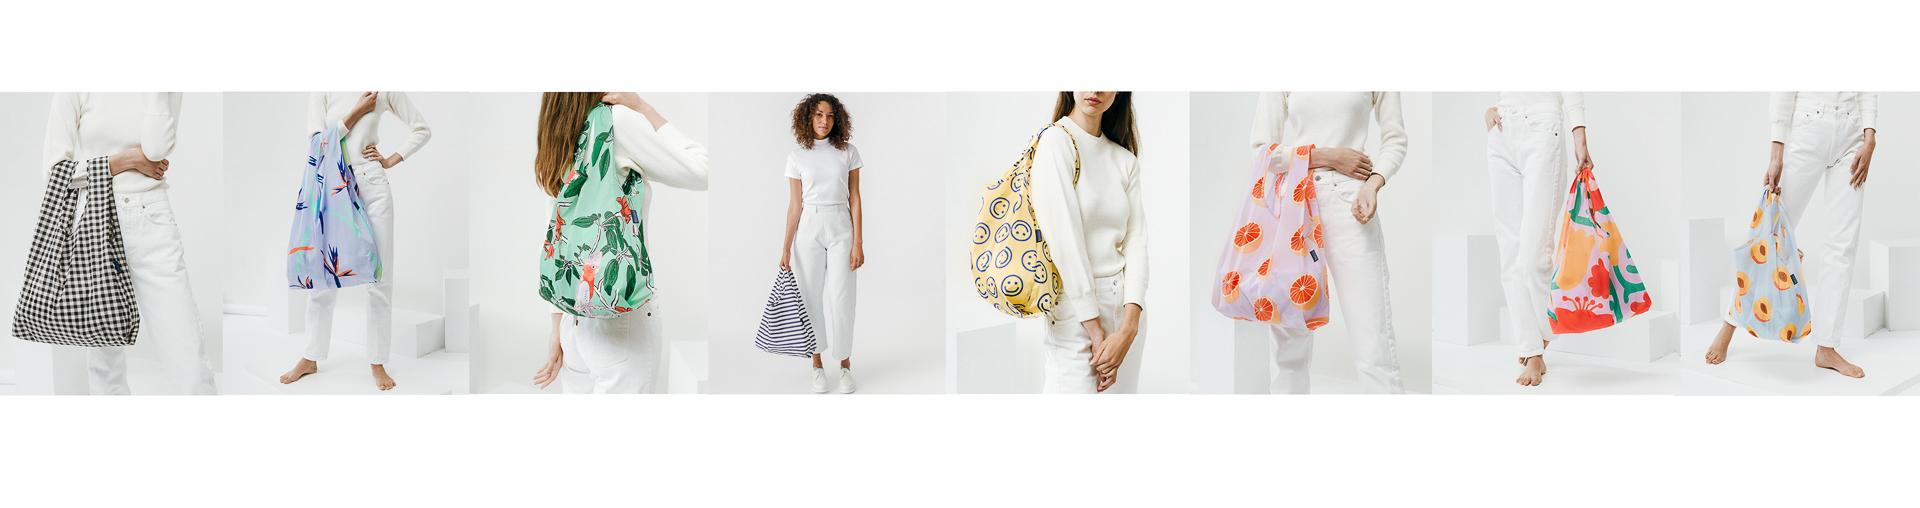 baggu-reusable-shopping-bag-banner.jpg